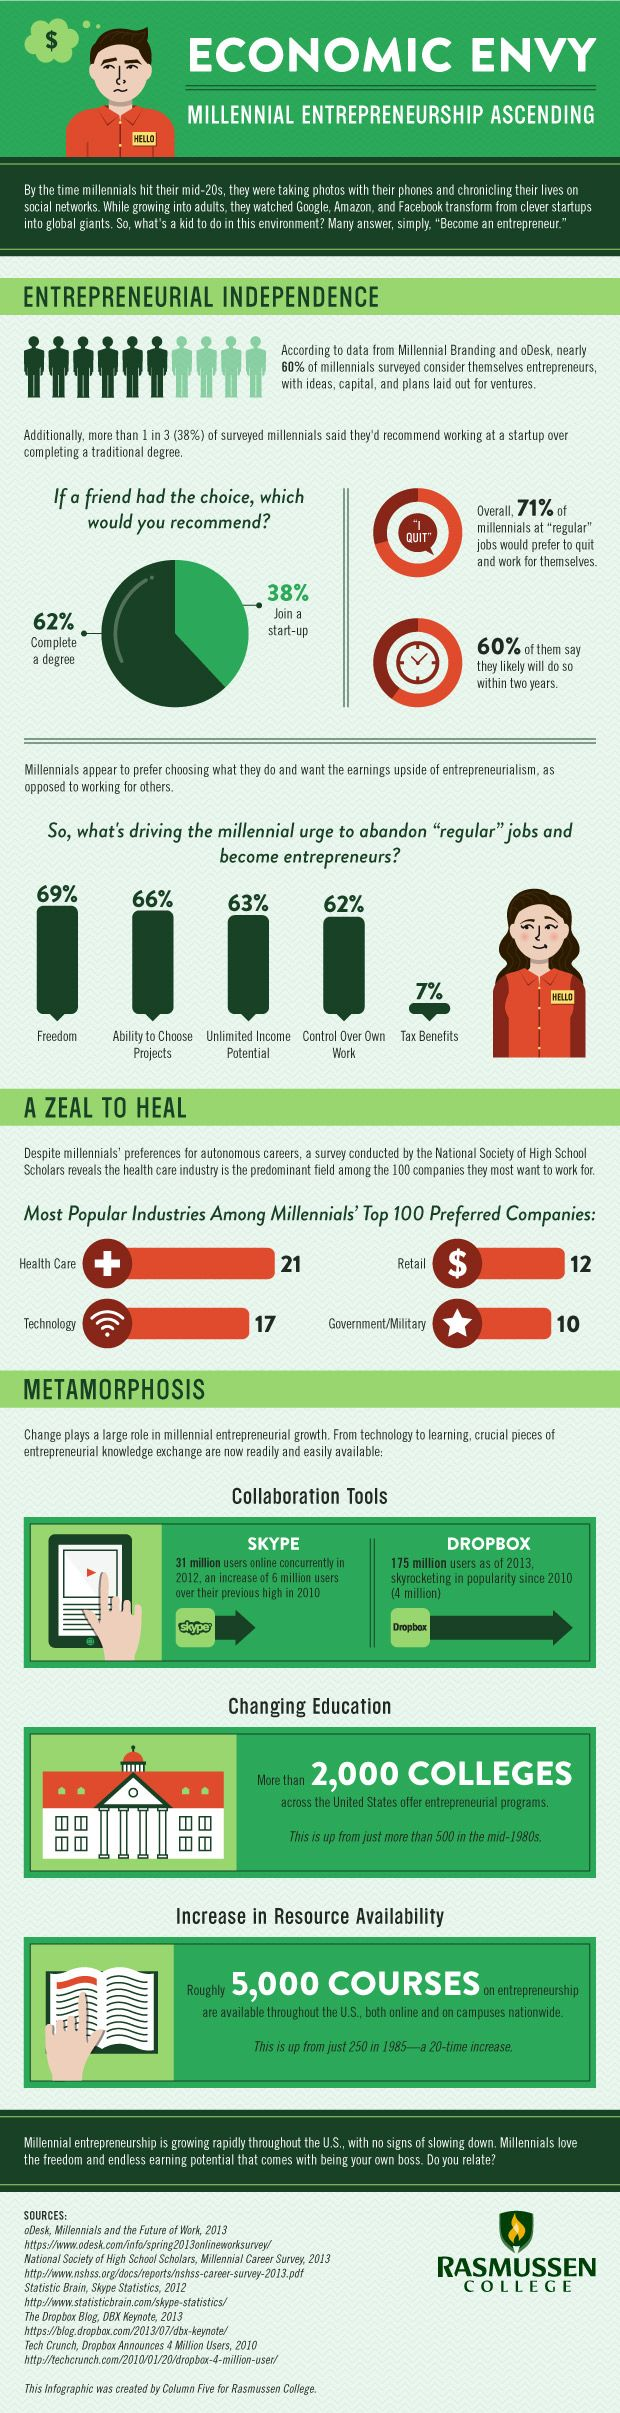 Millennials Are Snubbing the Corporate World for Entrepreneurship (Infographic)